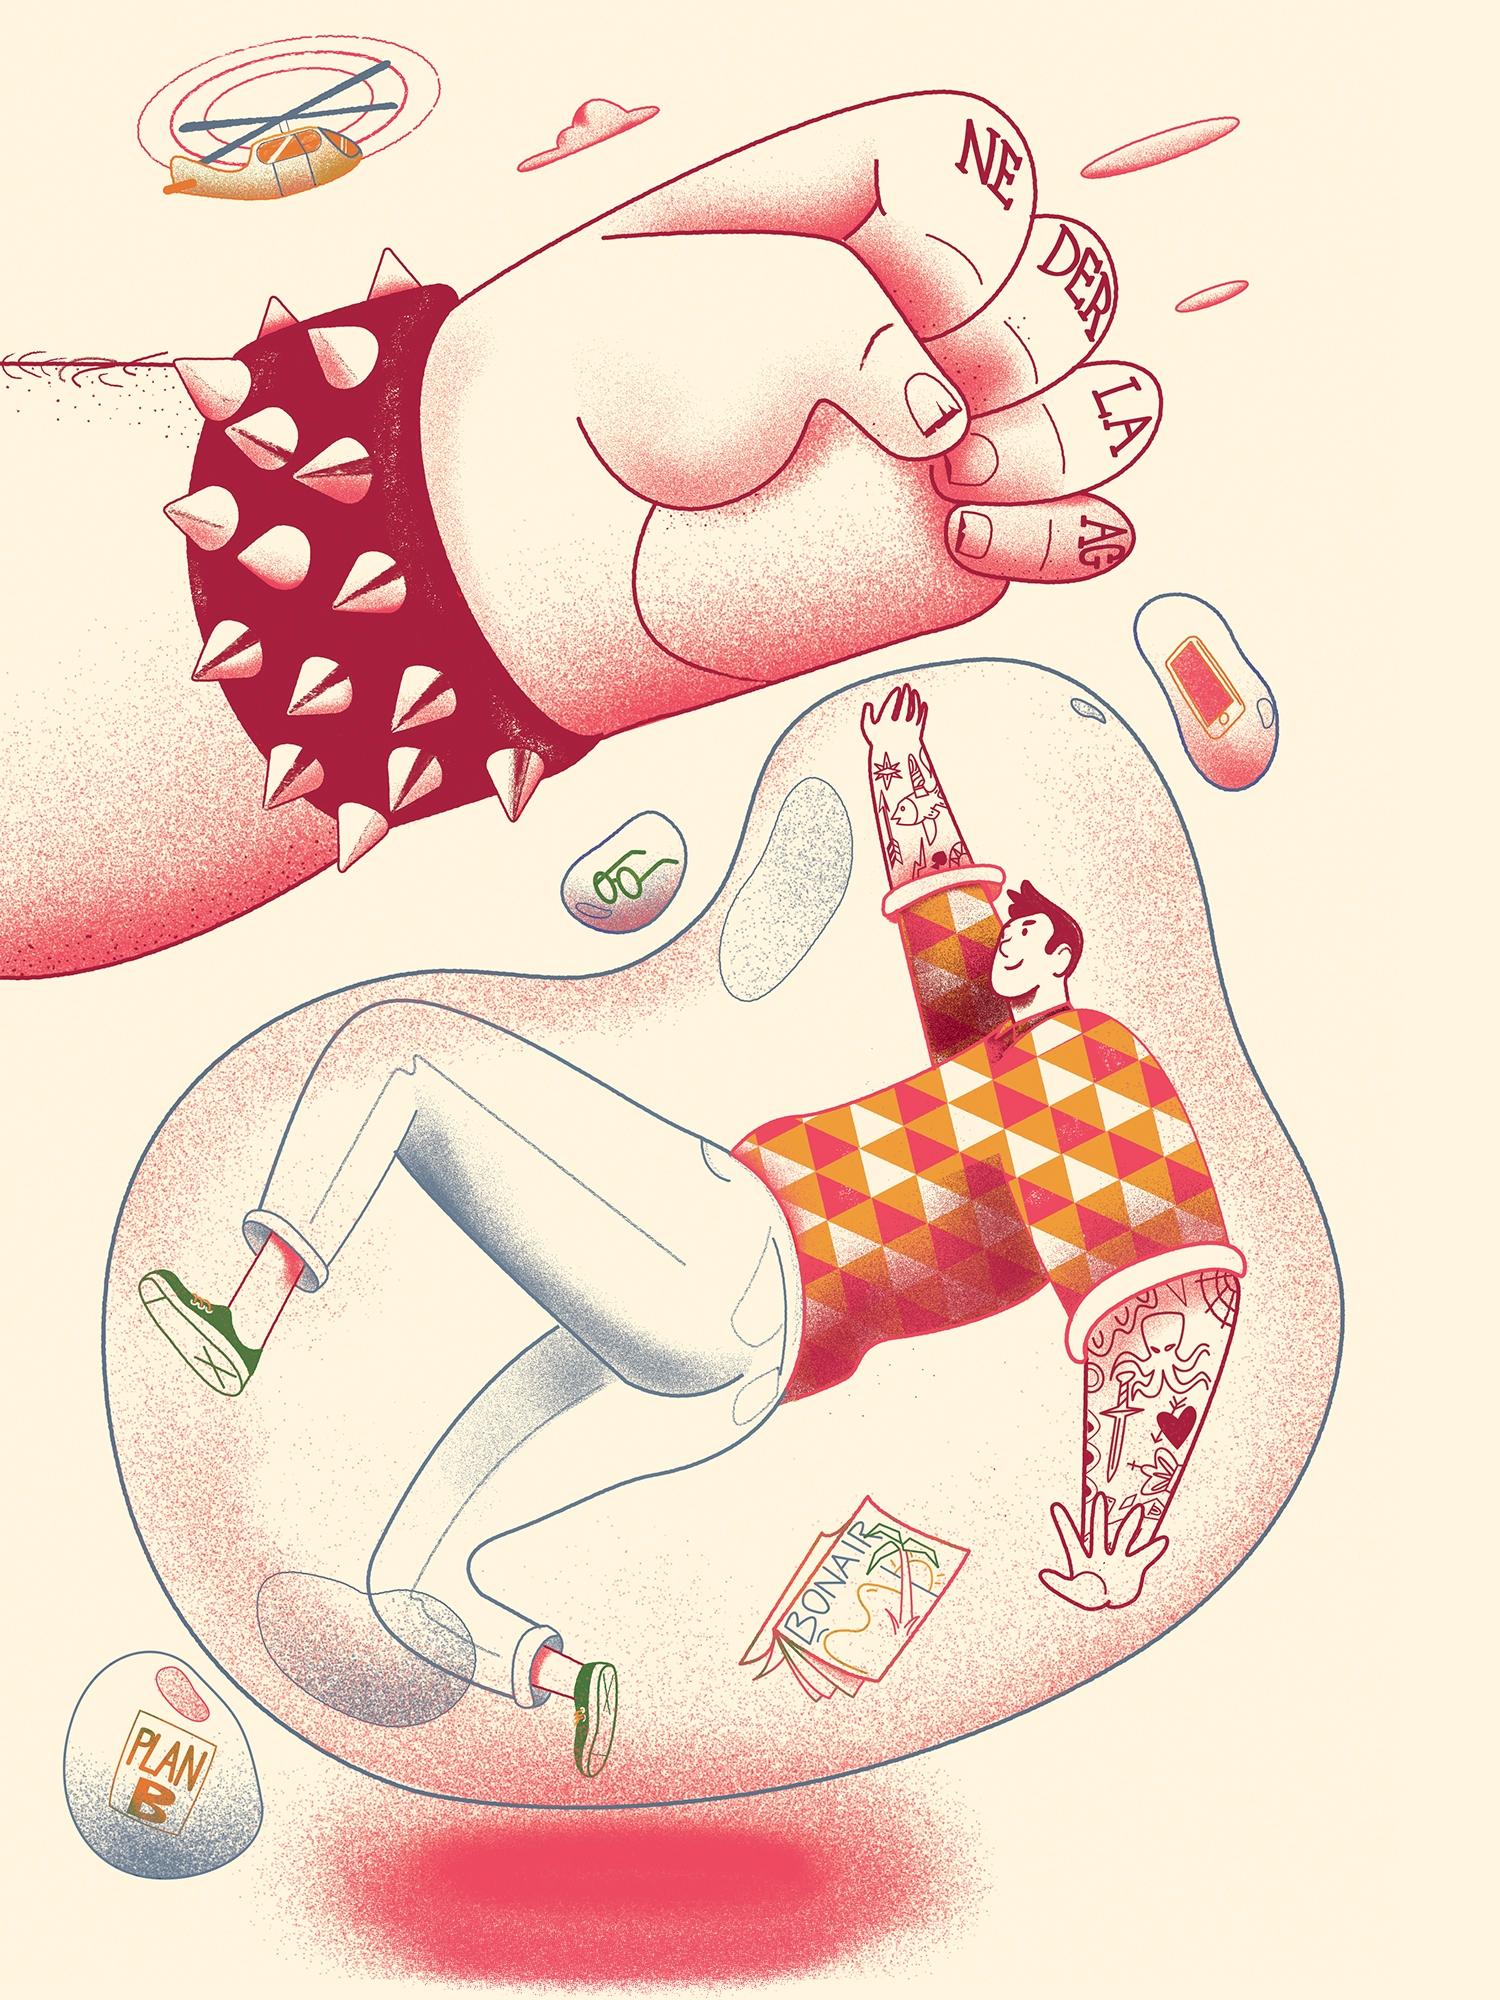 Latest illustration Health mag  - cesdavolio | ello